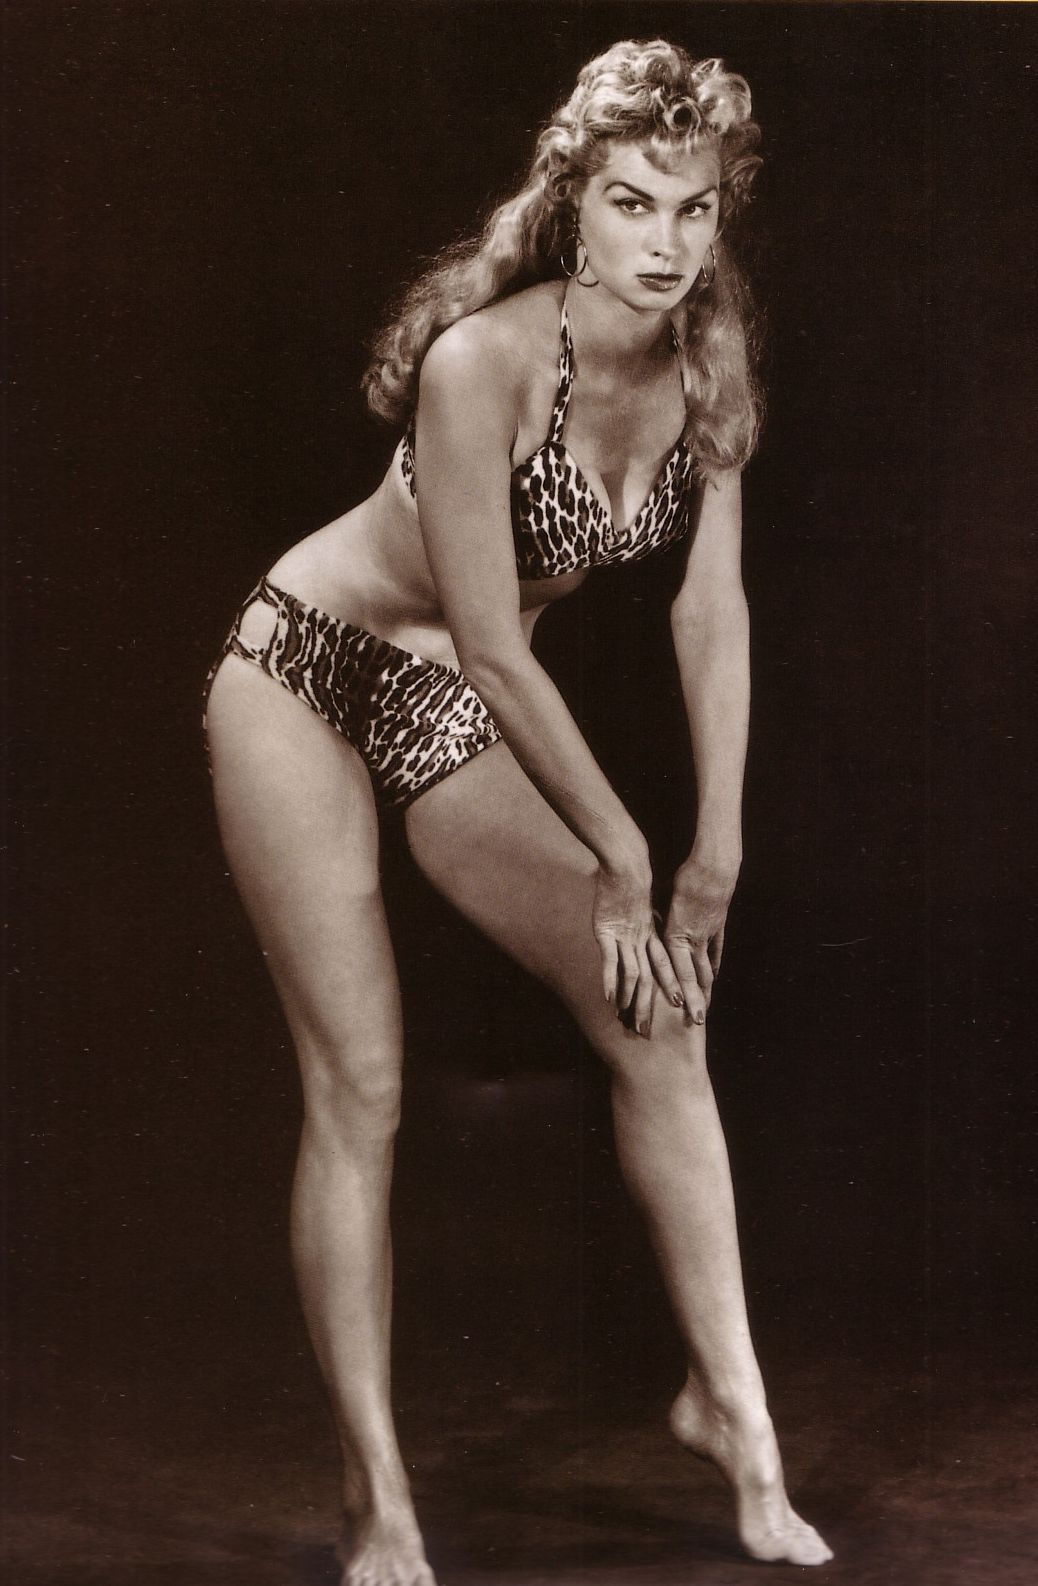 Vilma Santos (b. 1953),Kate Bosworth Hot picture Jamie Luner,Anne-Marie Johnson